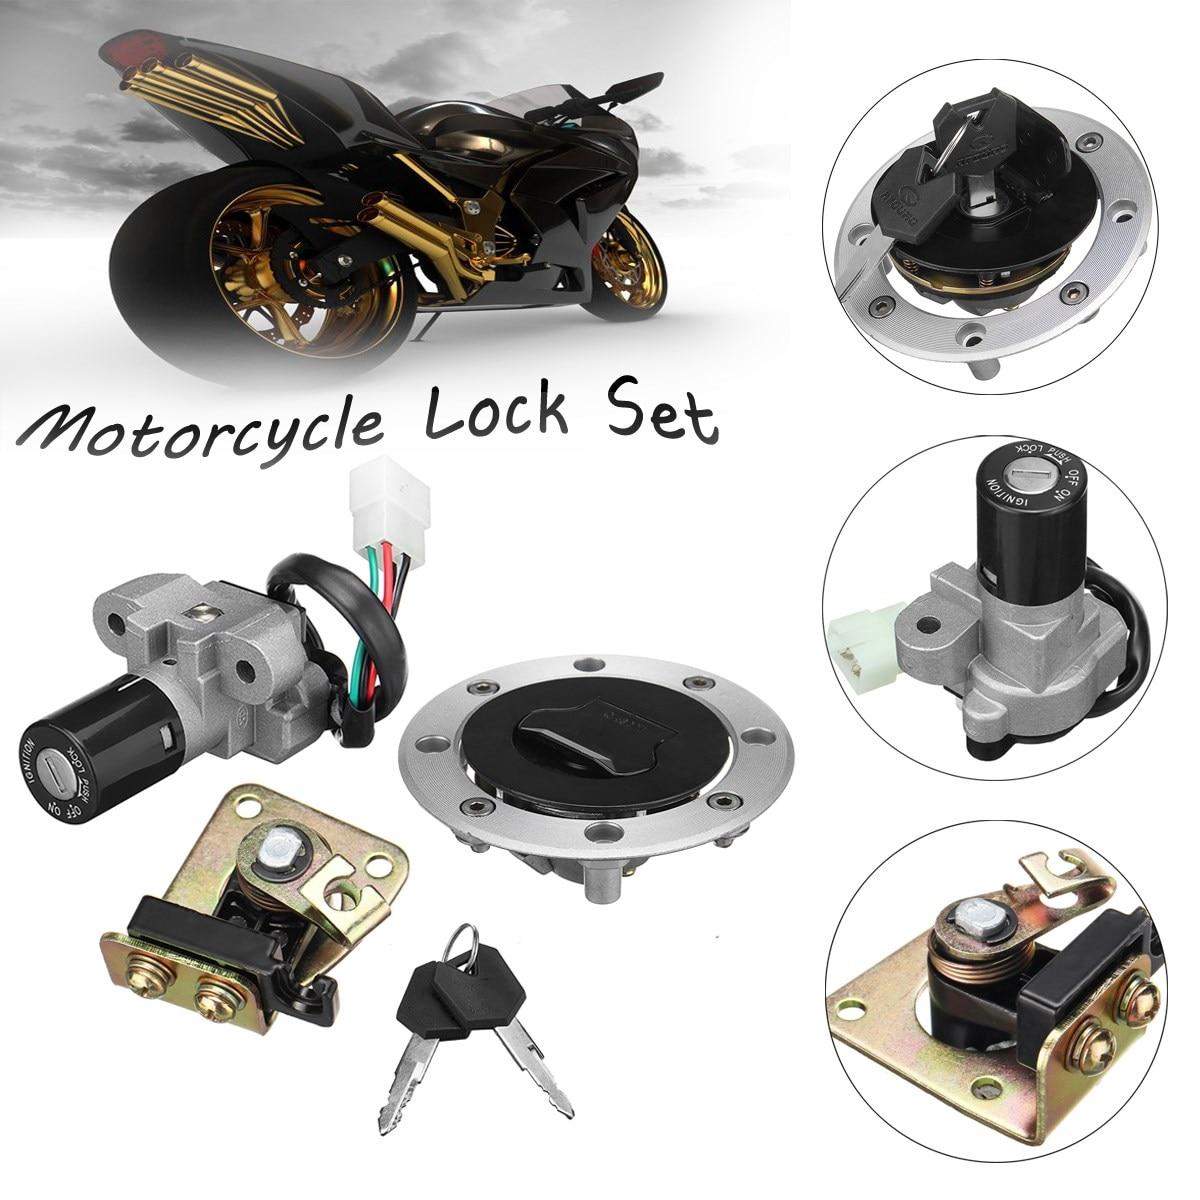 Ignition Switch Key Barrel Set Seat Lock Petrol for PCX 125 pcx125 2012-2013